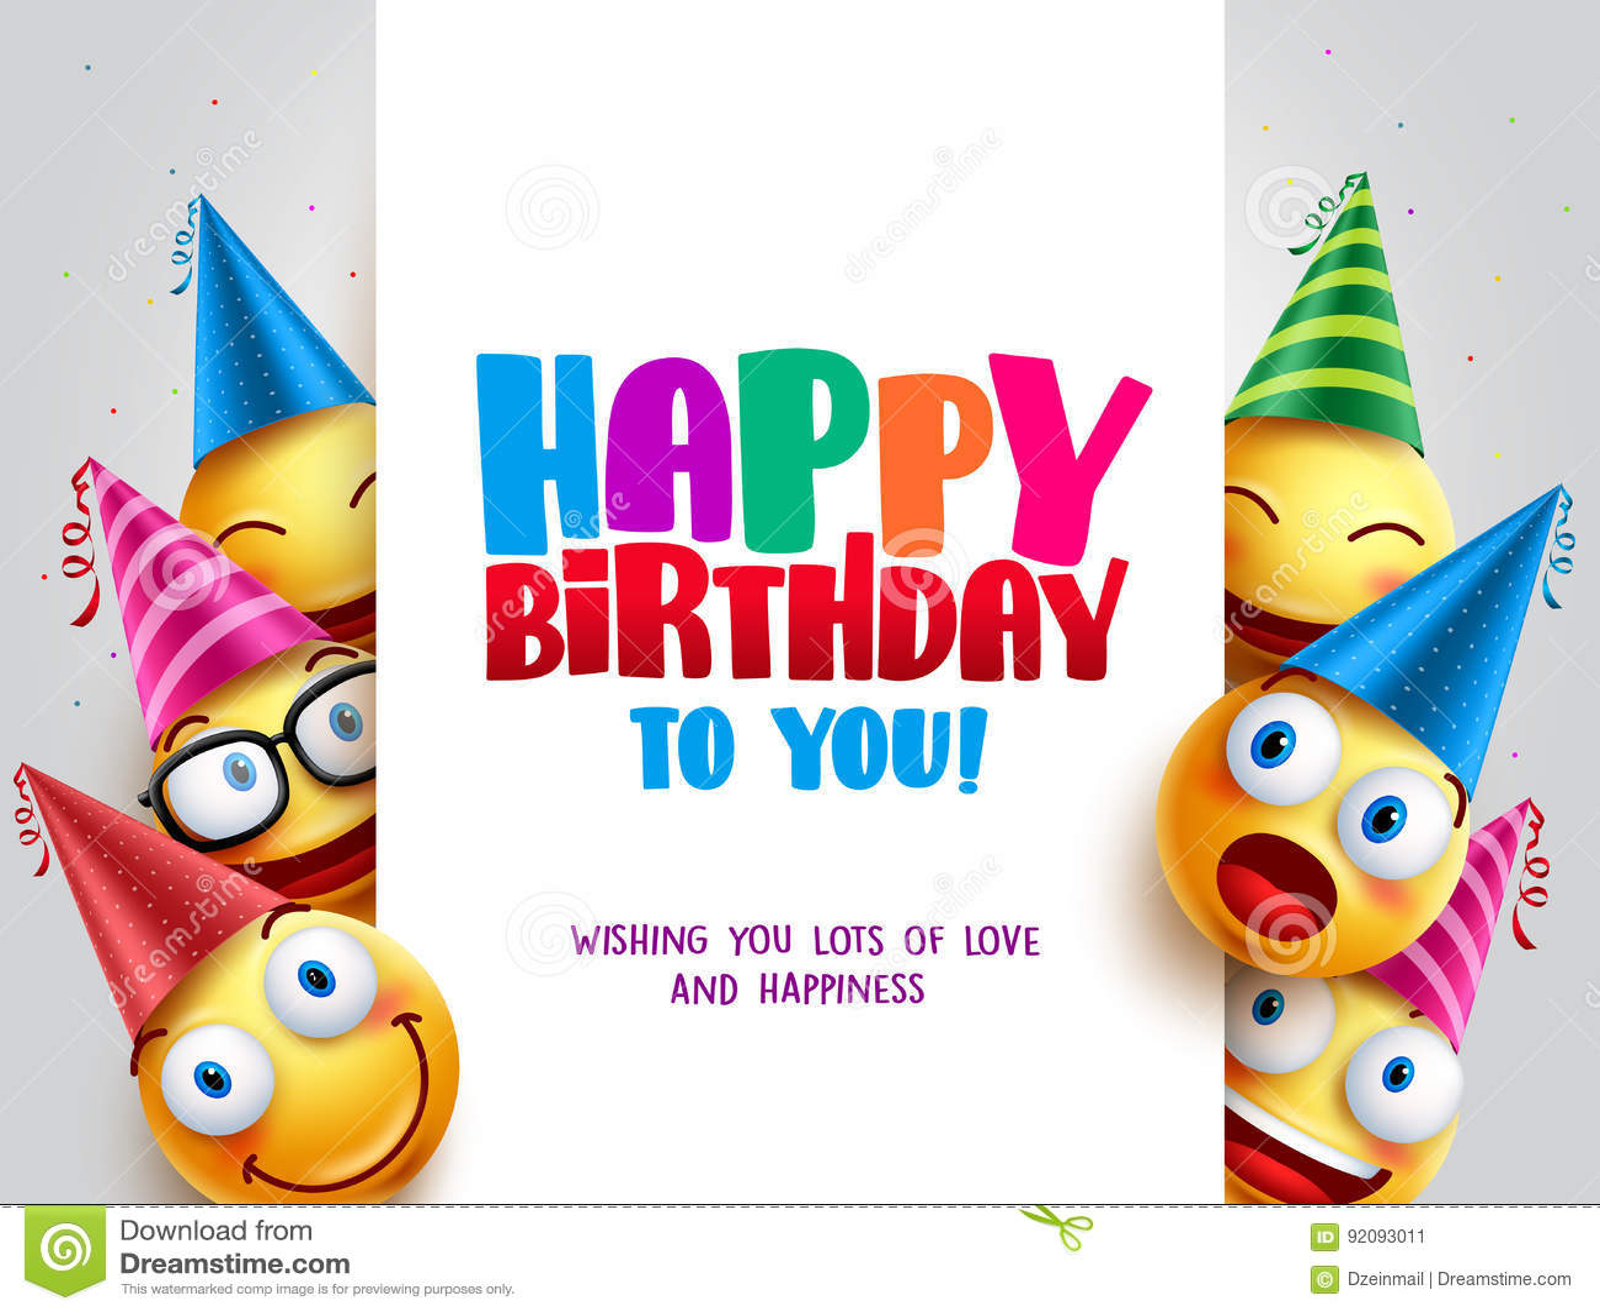 Happy Birthday Vector Design With Smileys Wearing Birthday